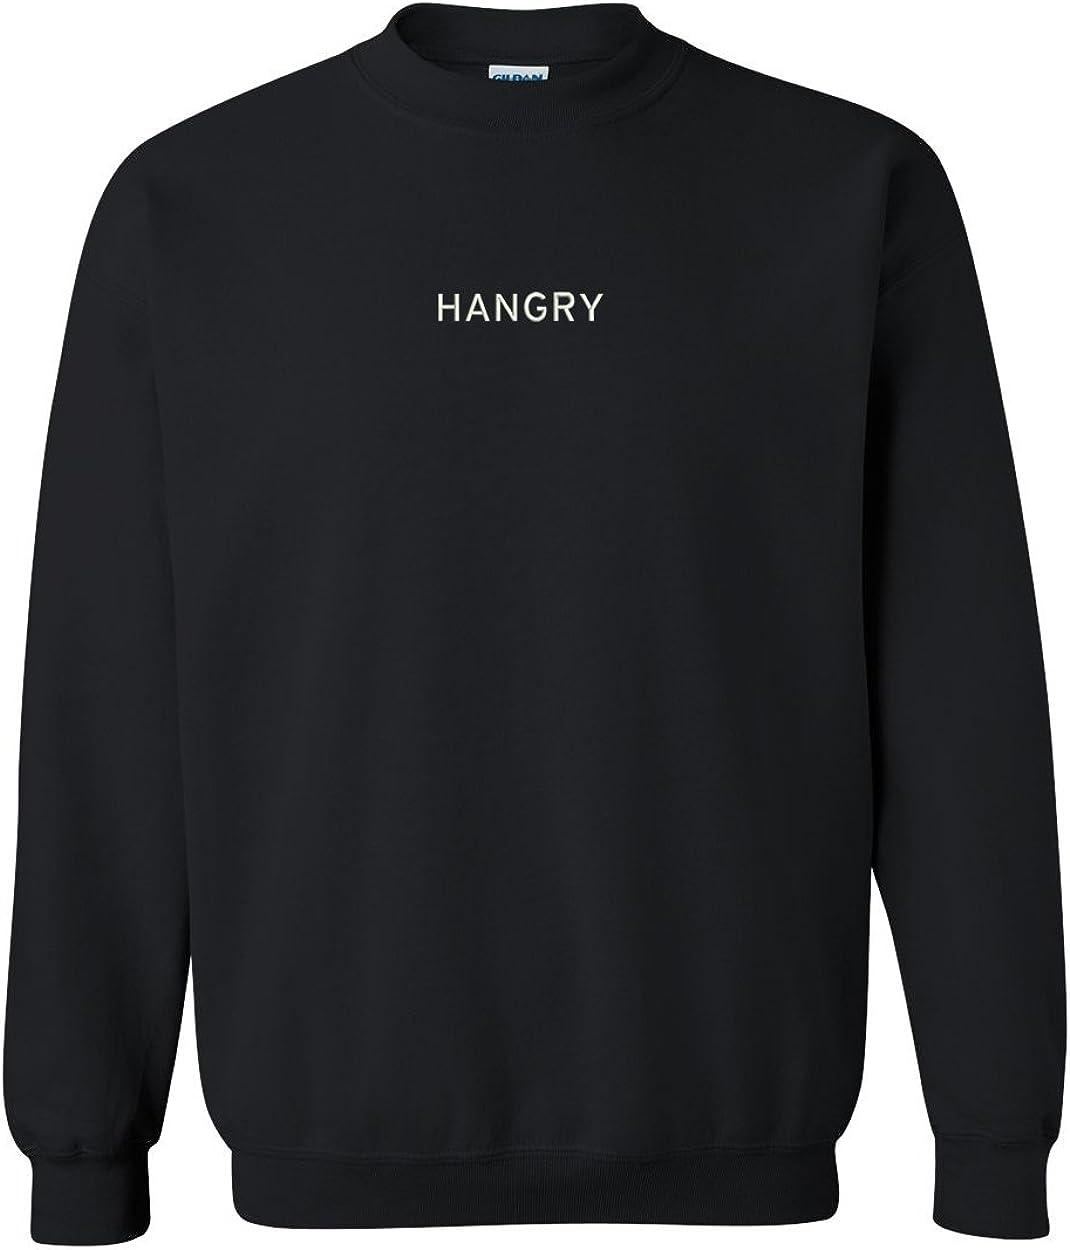 Trendy Apparel Shop Hangry Embroidered Crewneck Sweatshirt